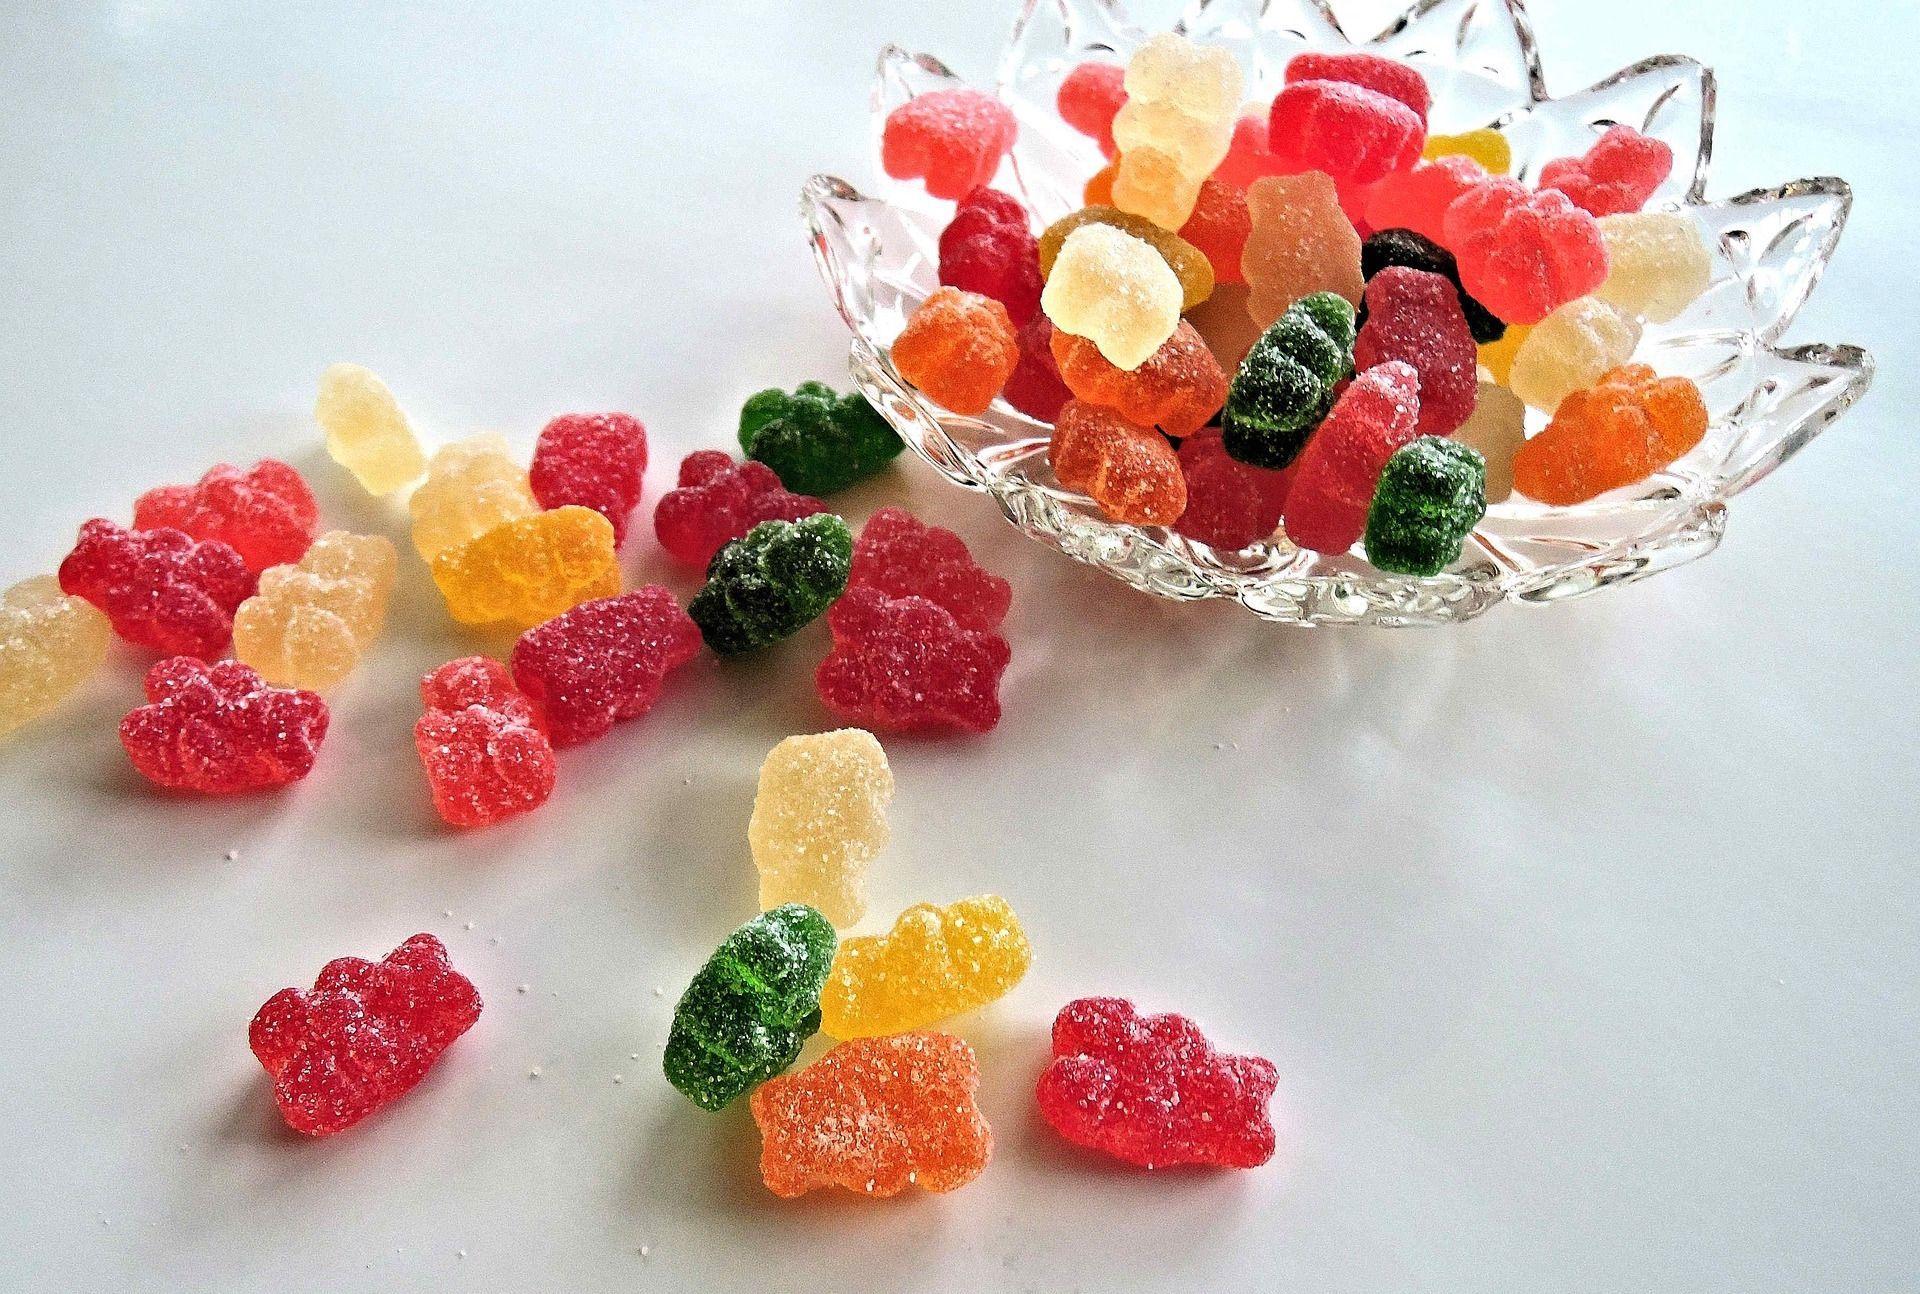 gelatina animale nelle caramelle gommose